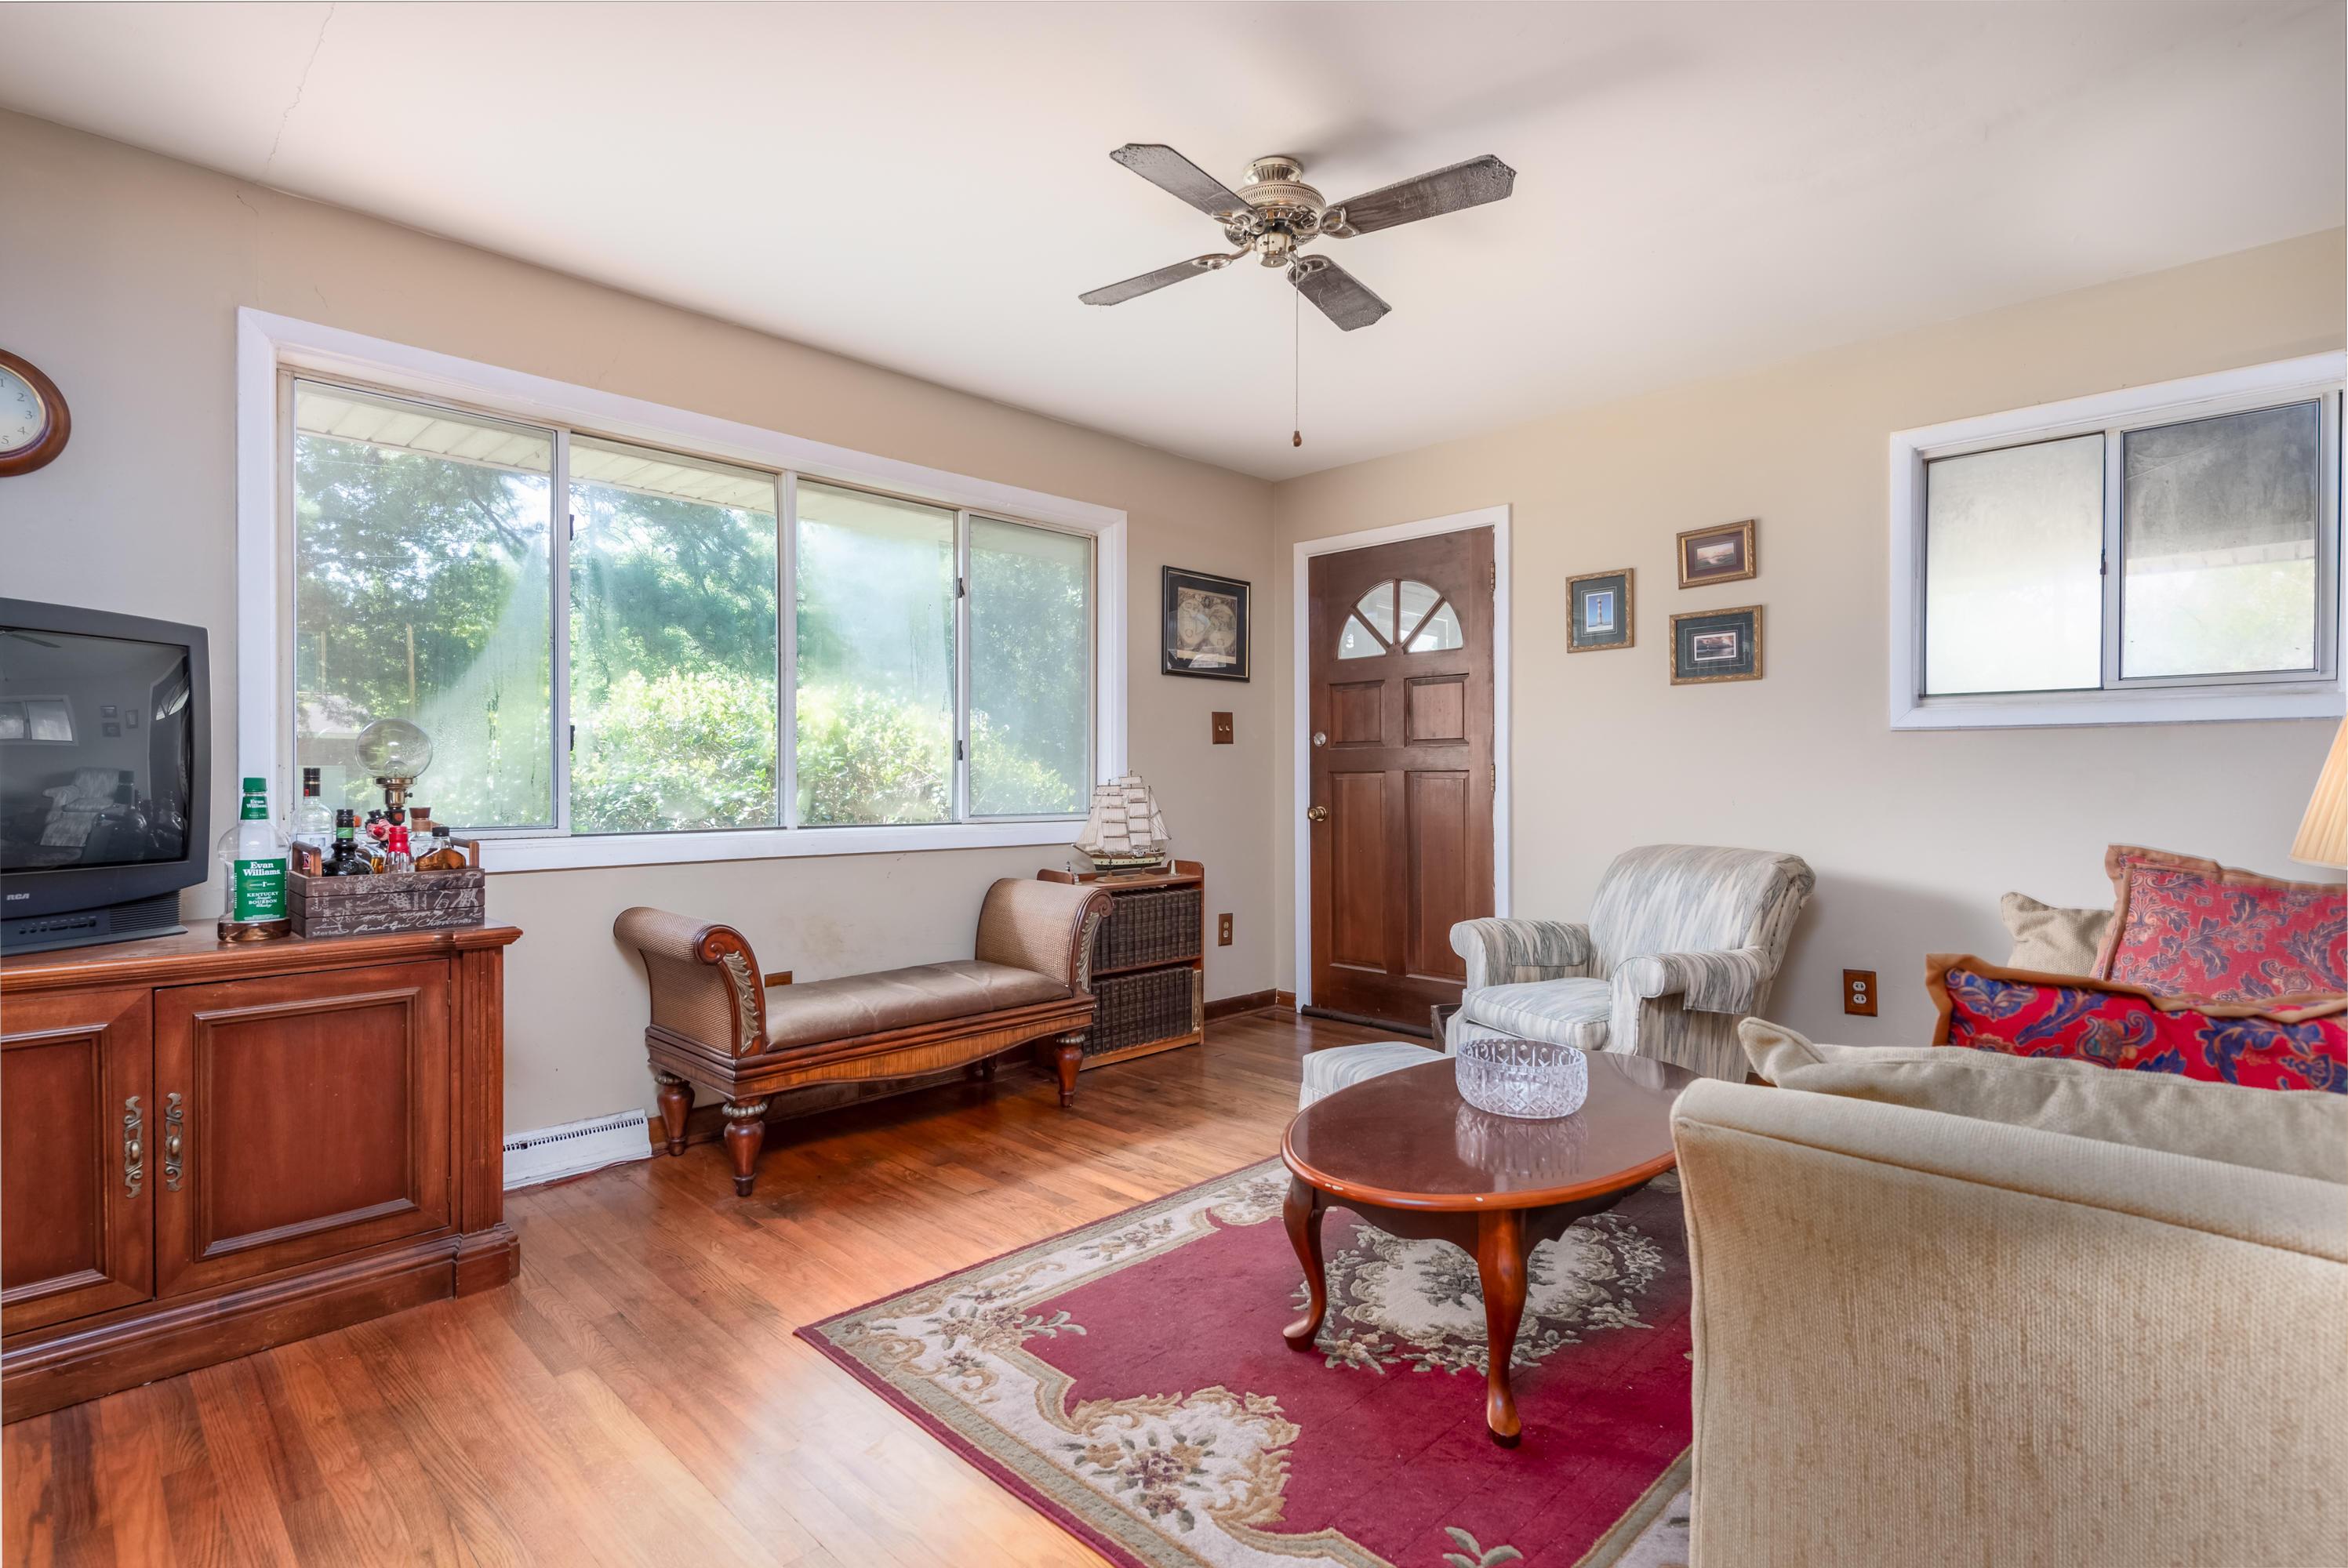 Old Mt Pleasant Homes For Sale - 916 Kincade, Mount Pleasant, SC - 7